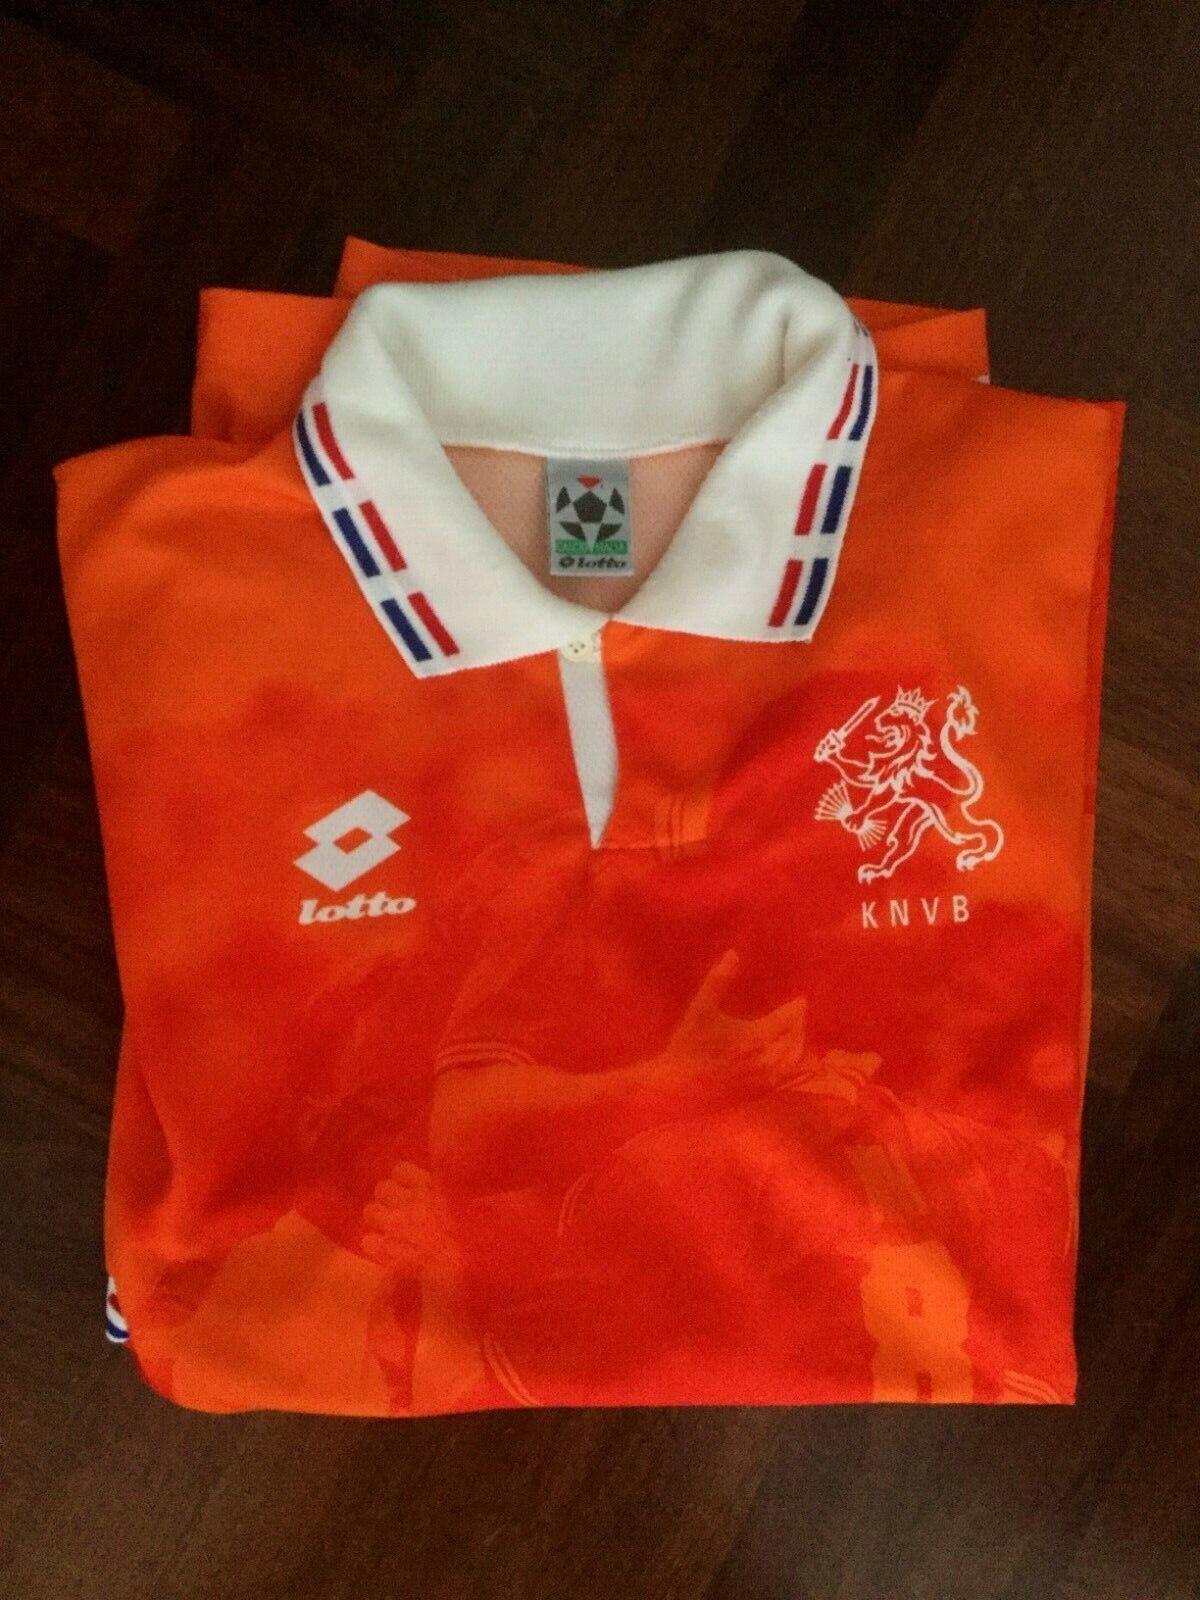 Maglia calcio lotto olanda netherland football shirt trikot vintage 1996 Dimensione XL